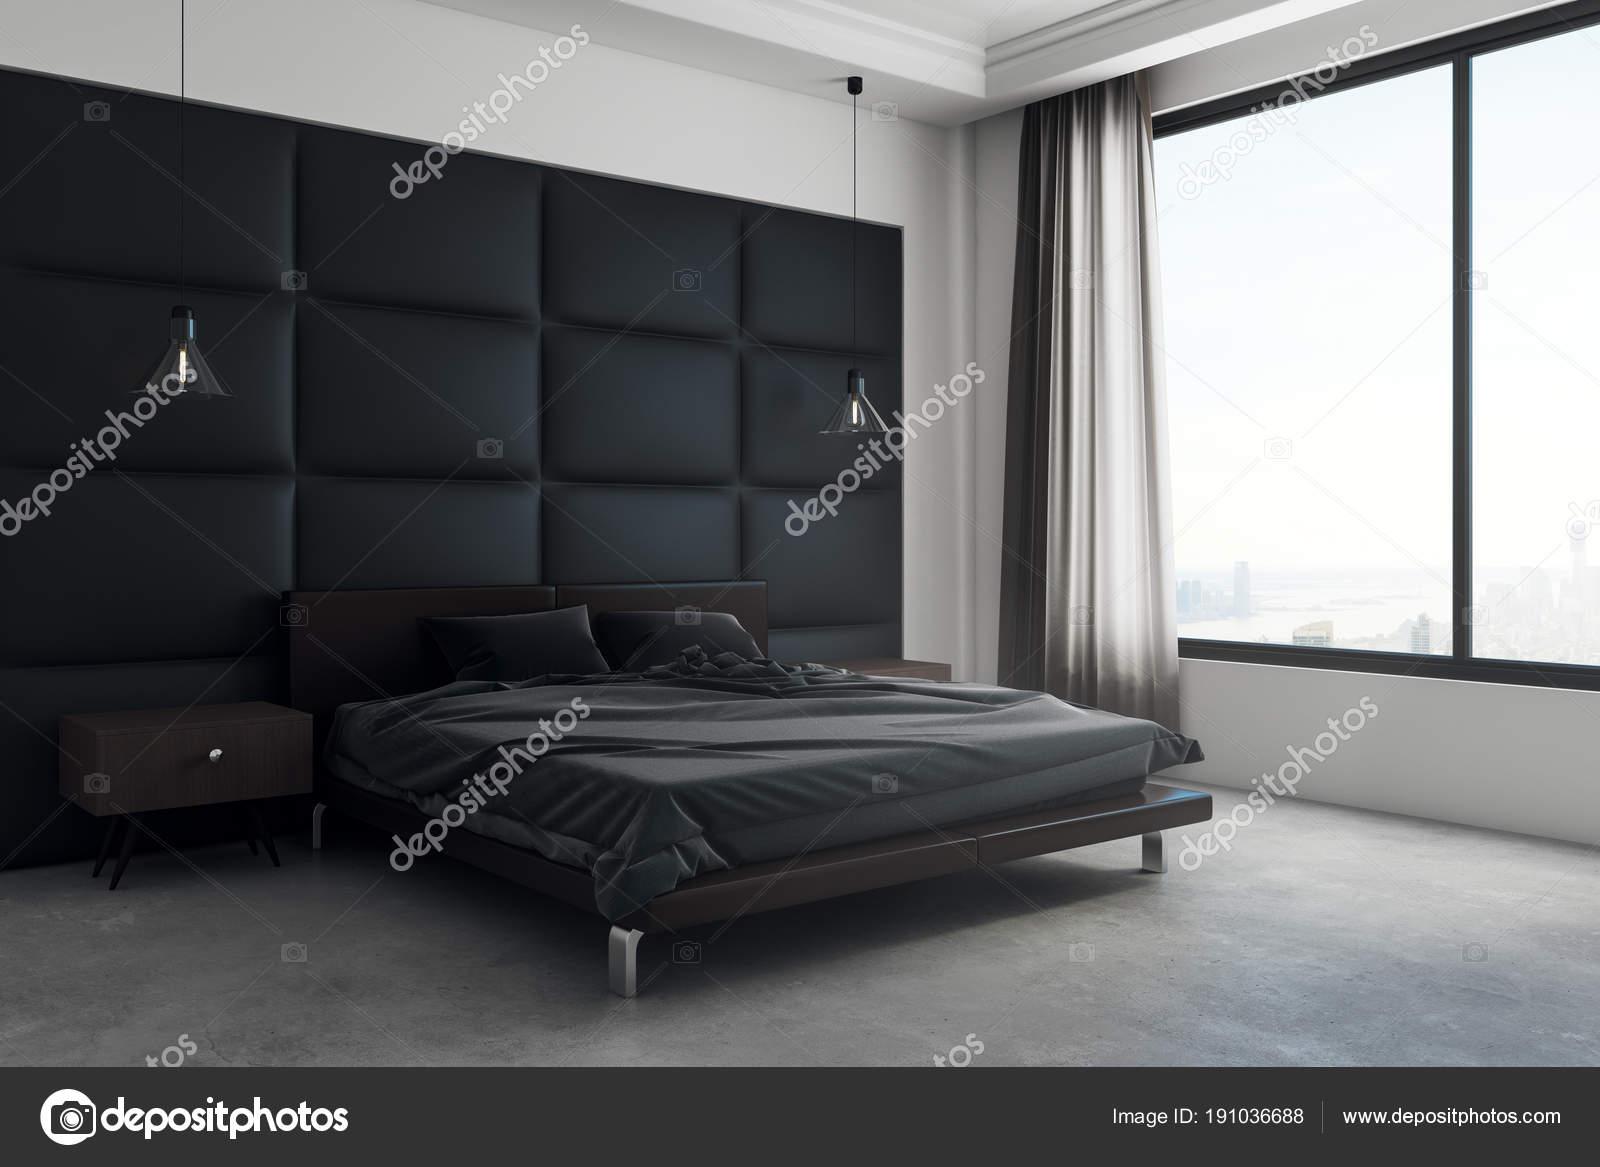 moderne Schlafzimmer-Interieur — Stockfoto © peshkova #191036688